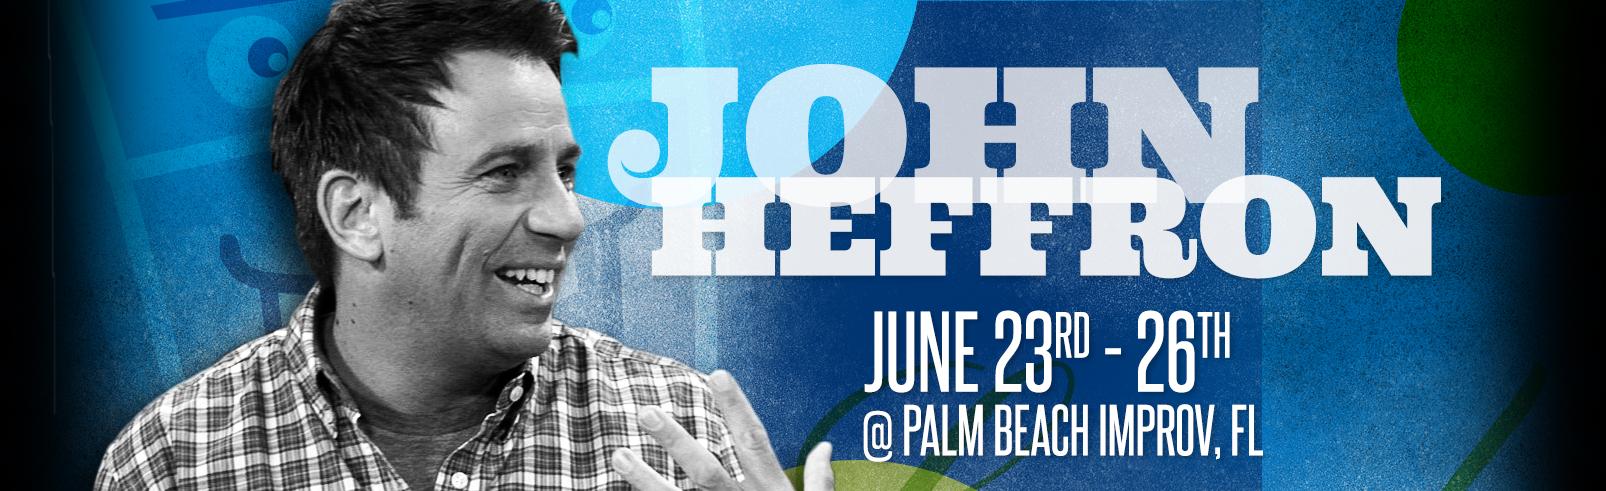 John Heffron @ Palm Beach Improv